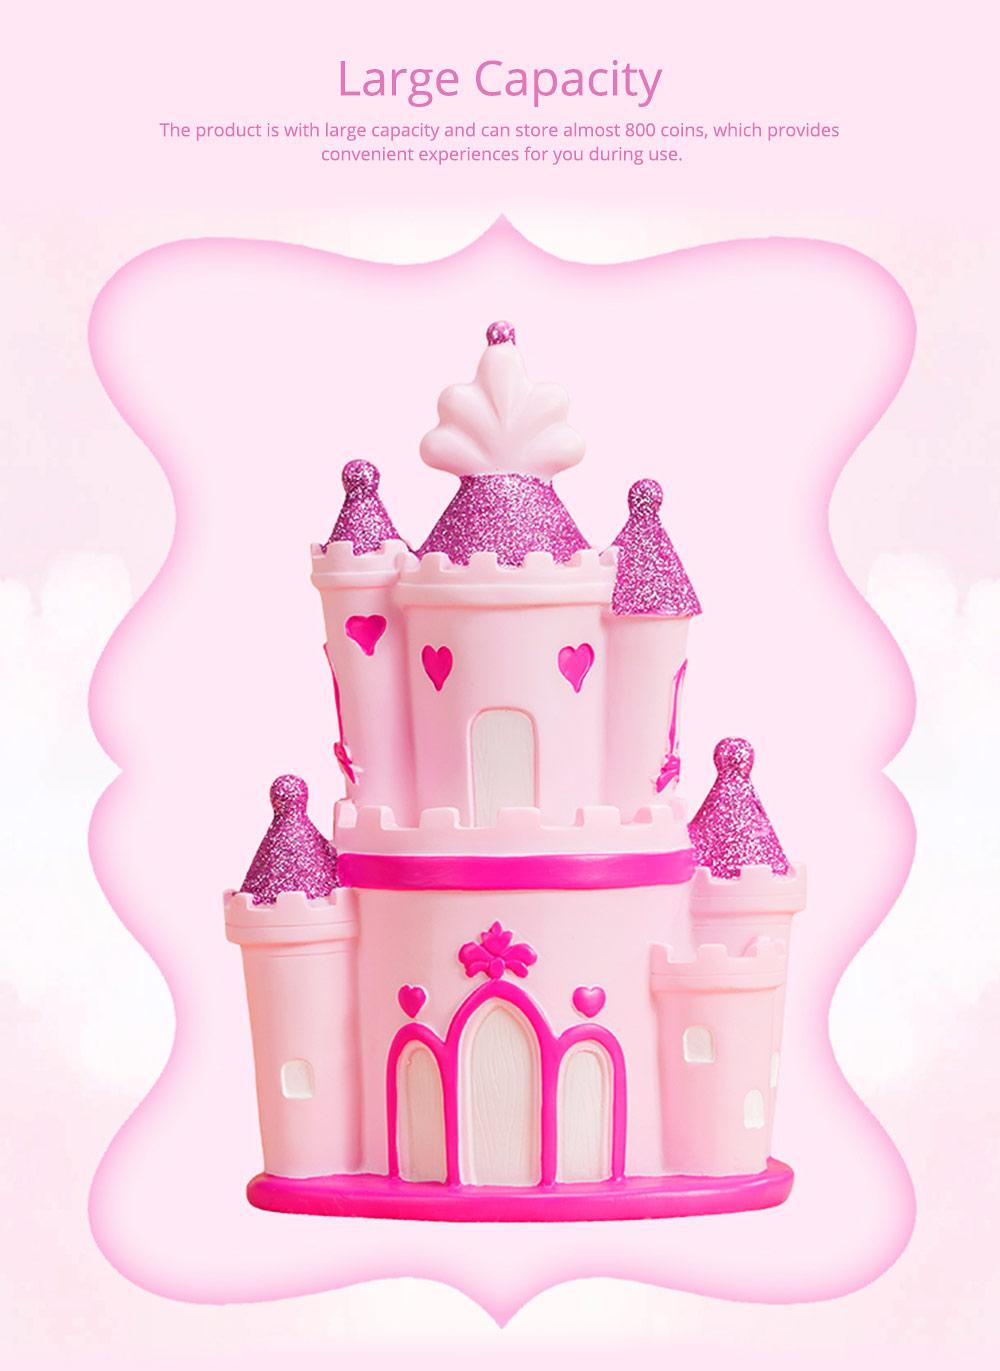 Creative Princess Castle Money Box for Girls, Delicate Elegant Pink Fairytale Castle Birthday Present Piggy Bank 2